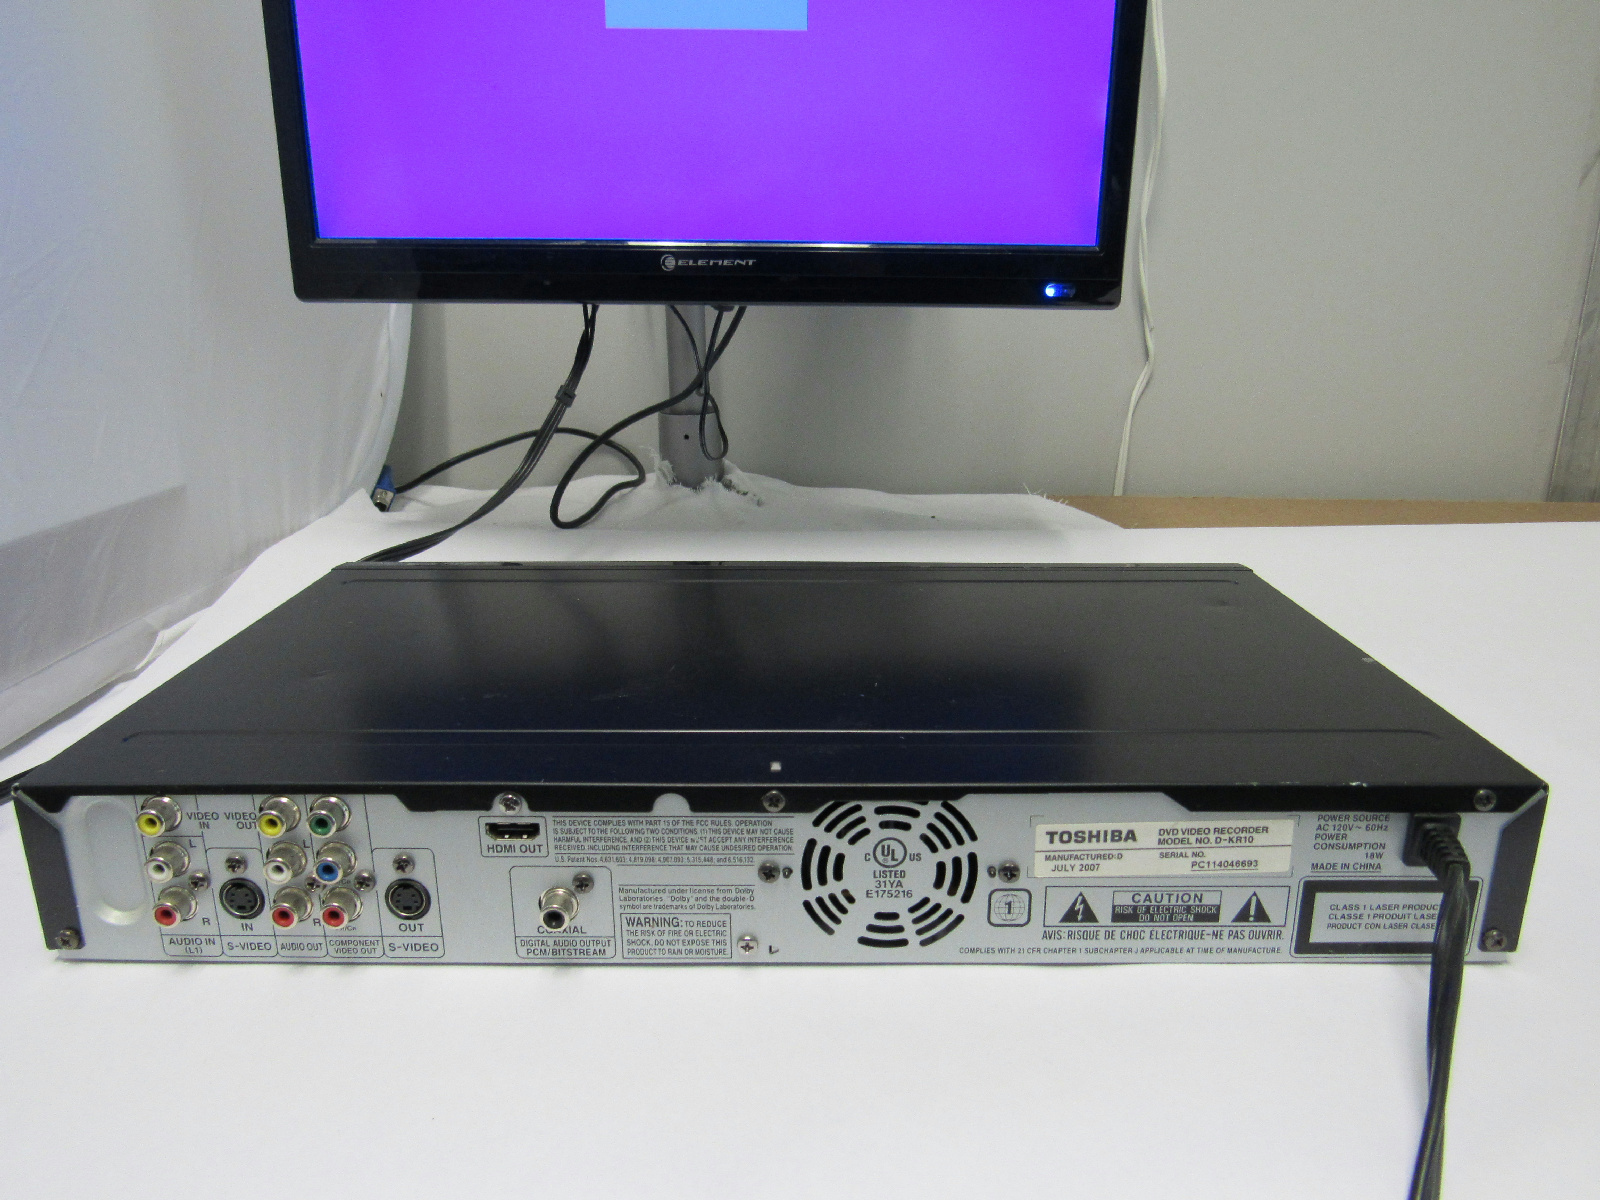 toshiba d kr10 dvd recorder player hdmi 1080p upconversion. Black Bedroom Furniture Sets. Home Design Ideas